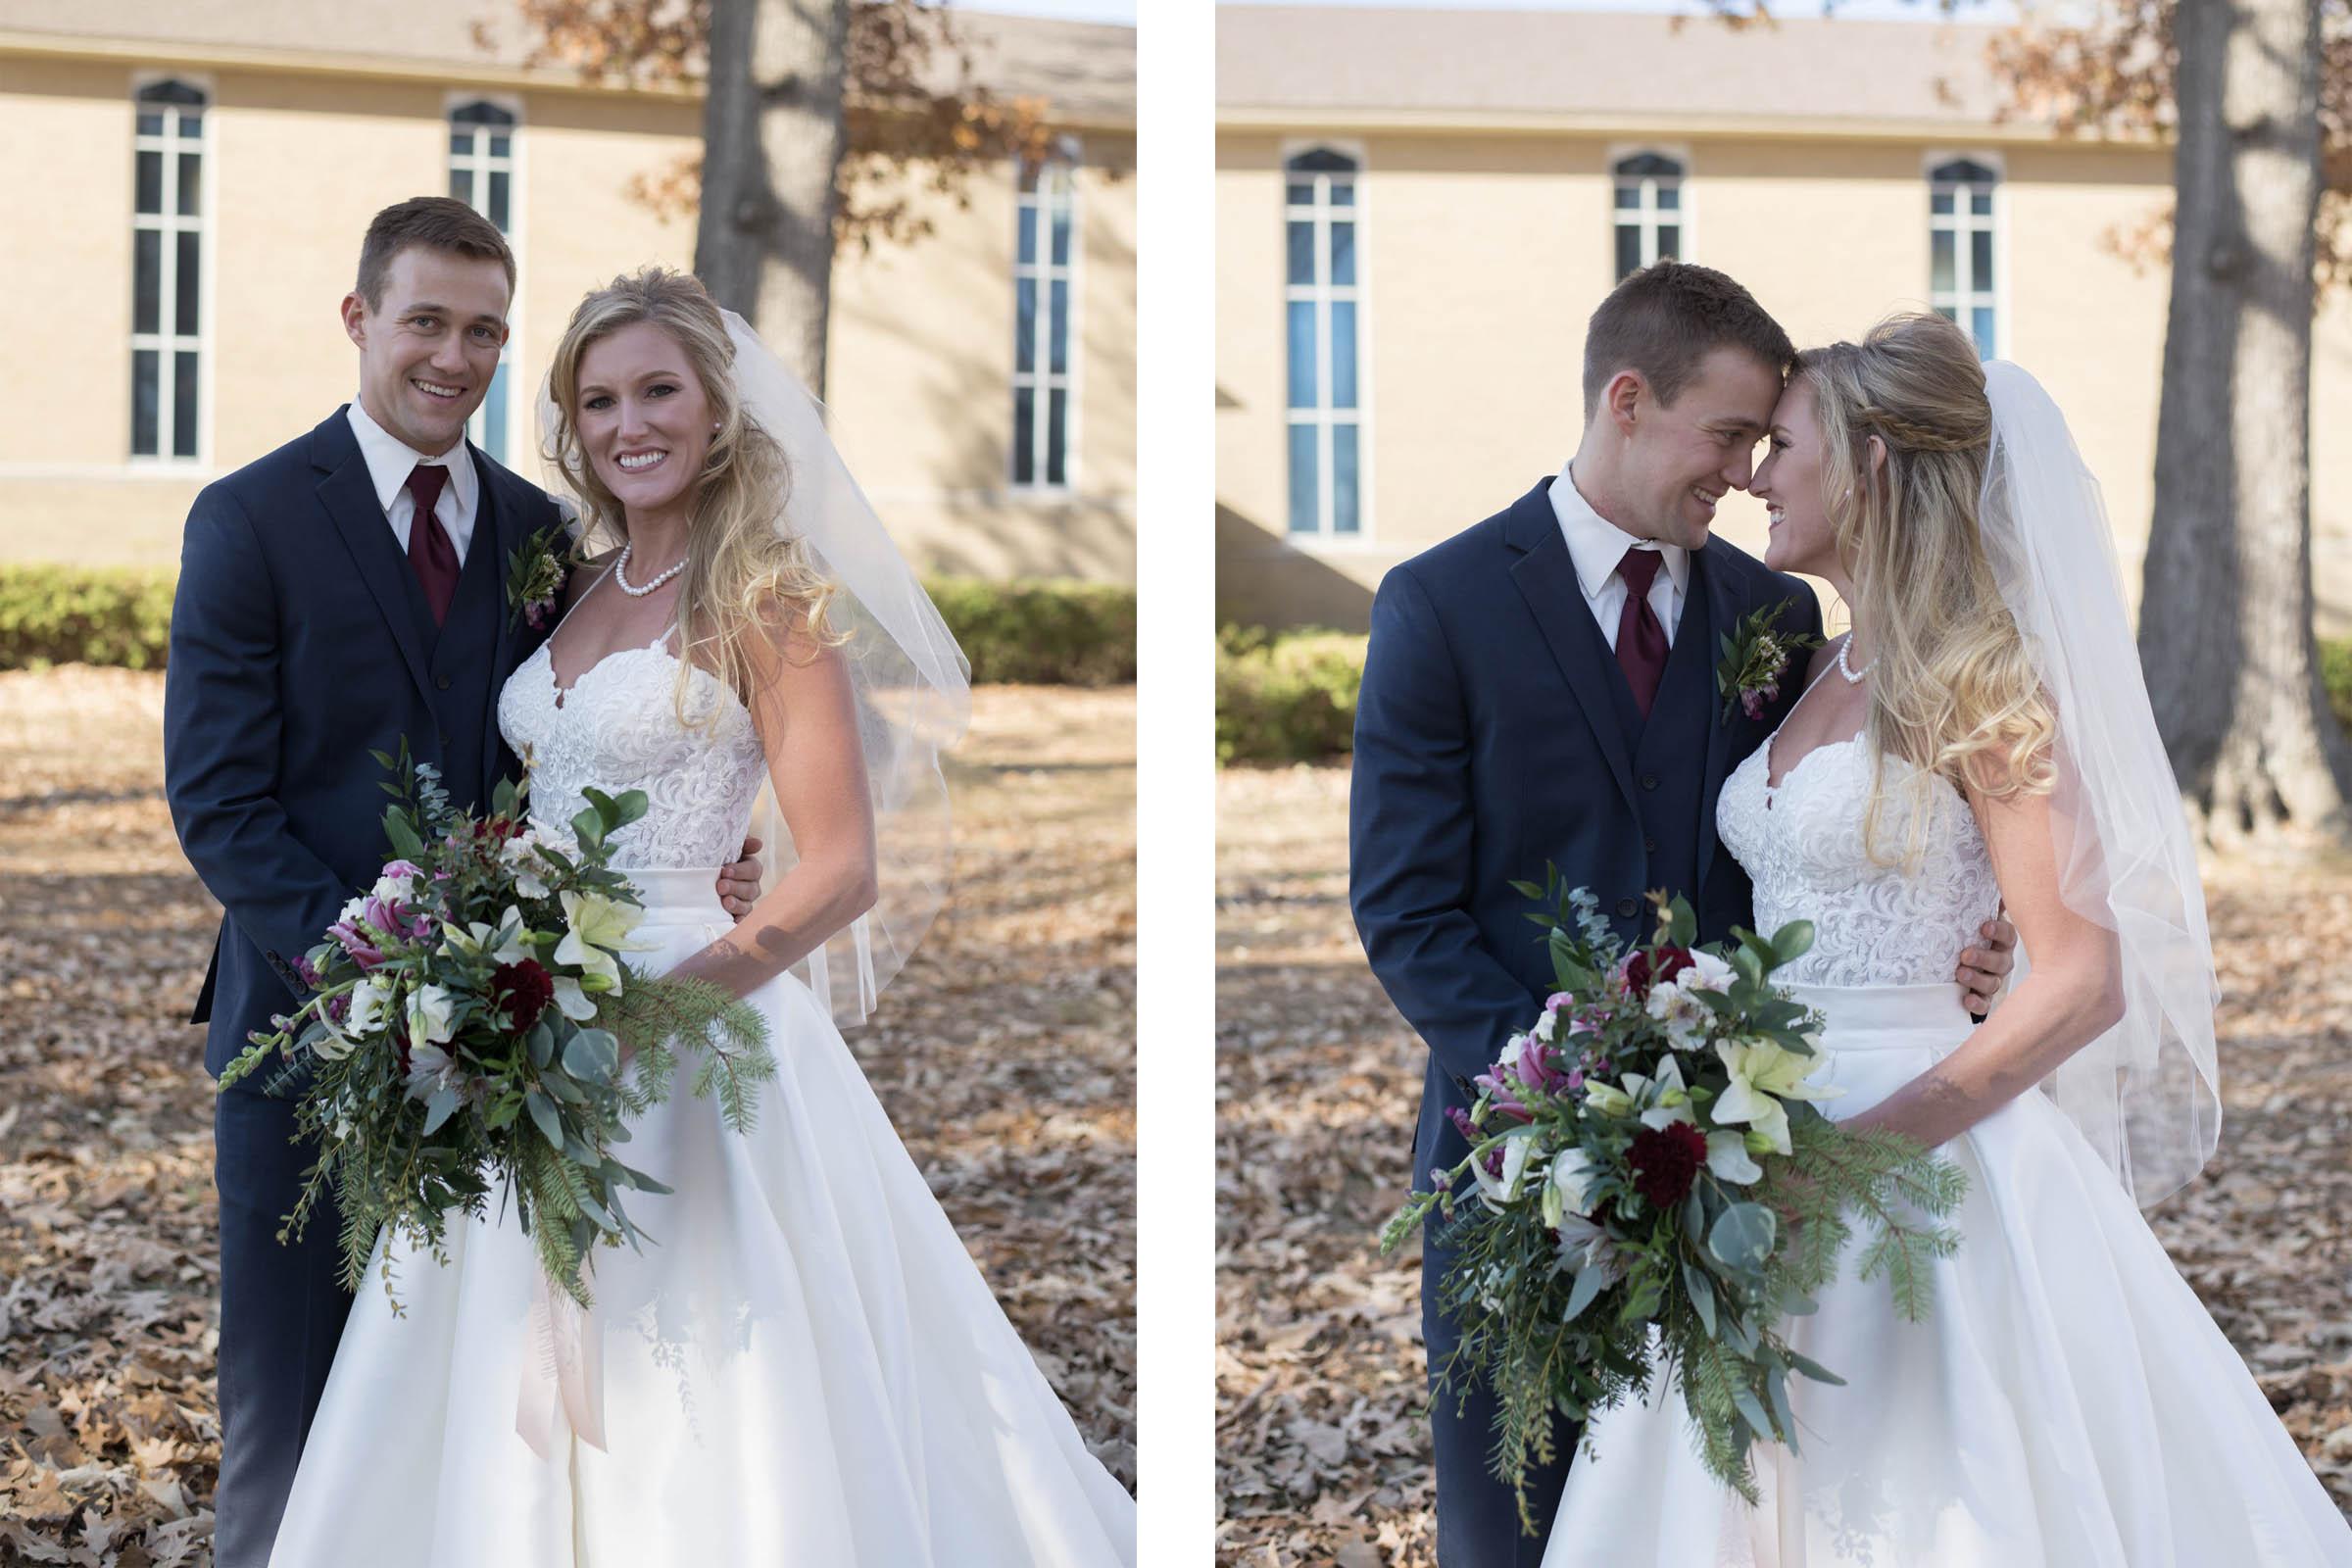 Affordable Charlotte Weddington NC Wedding photographer Brittany Sue Photo NC.jpg